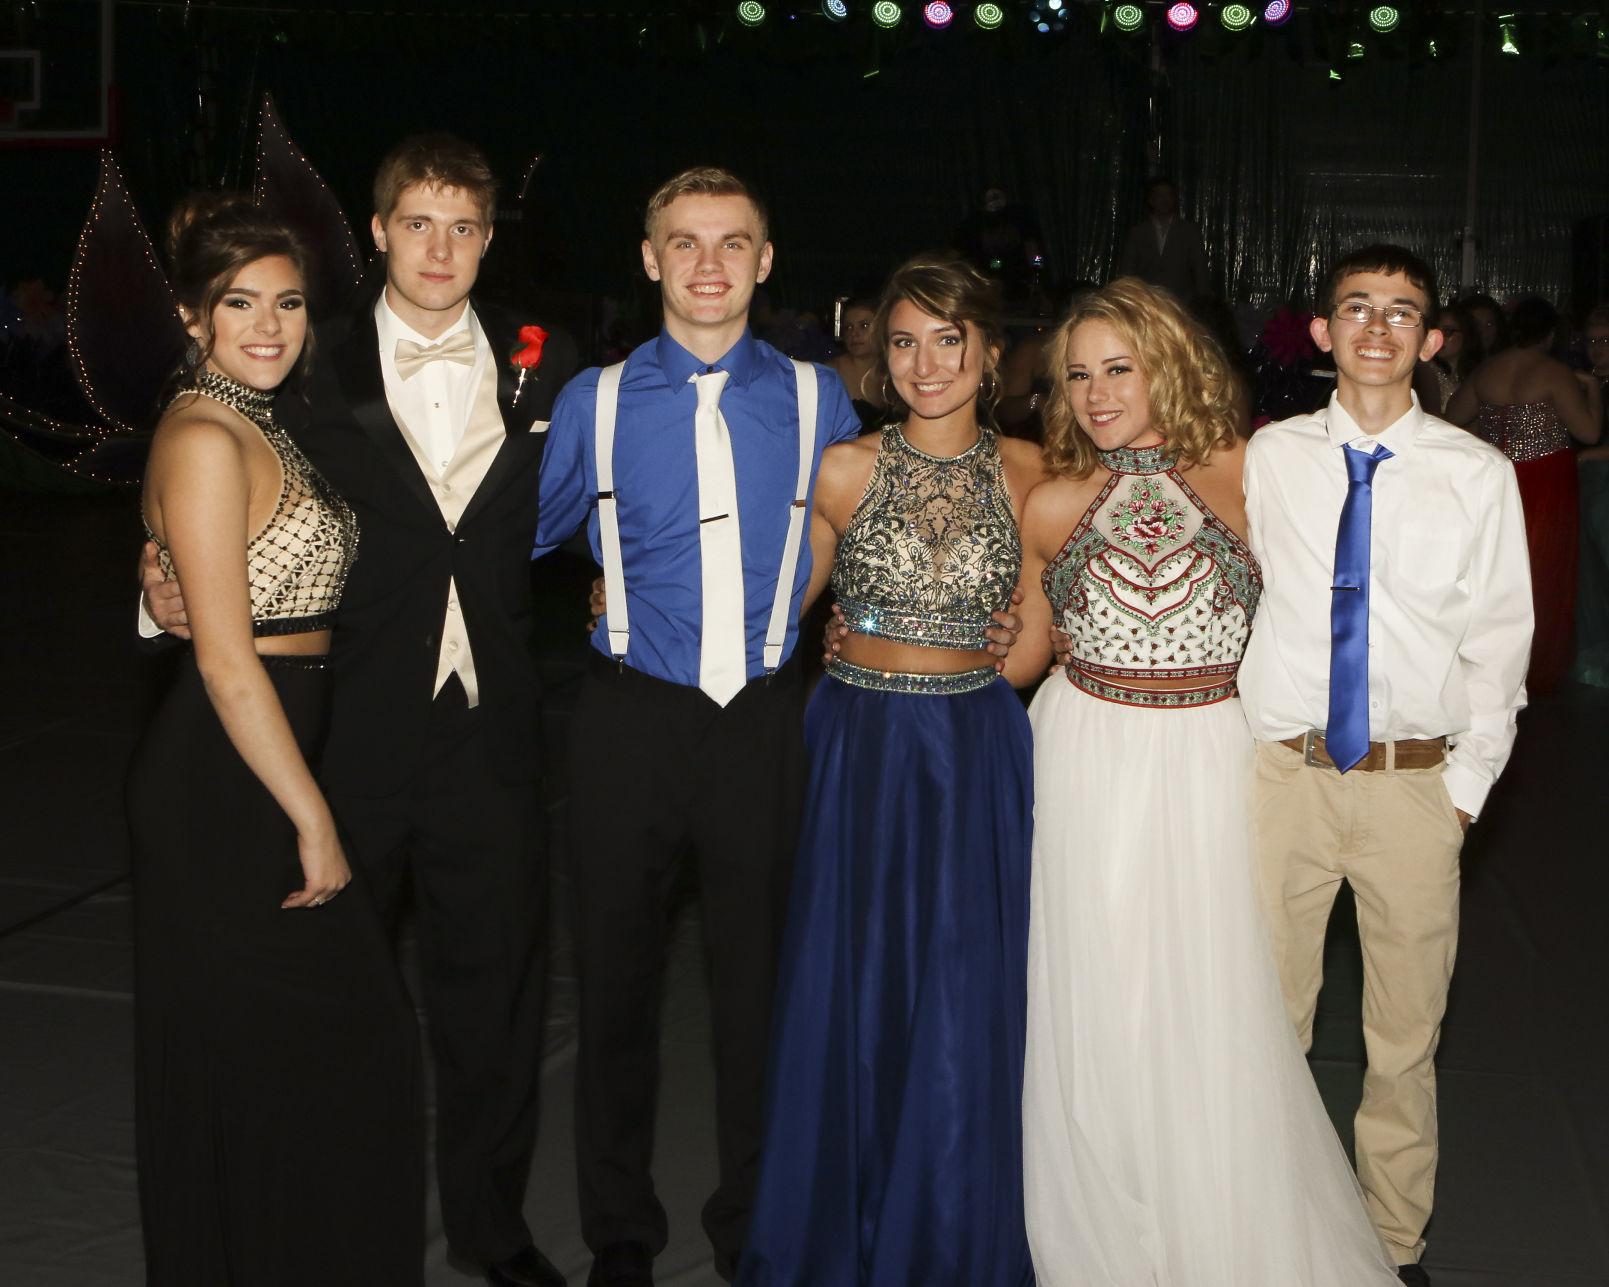 Photos Cabell Midland High School prom